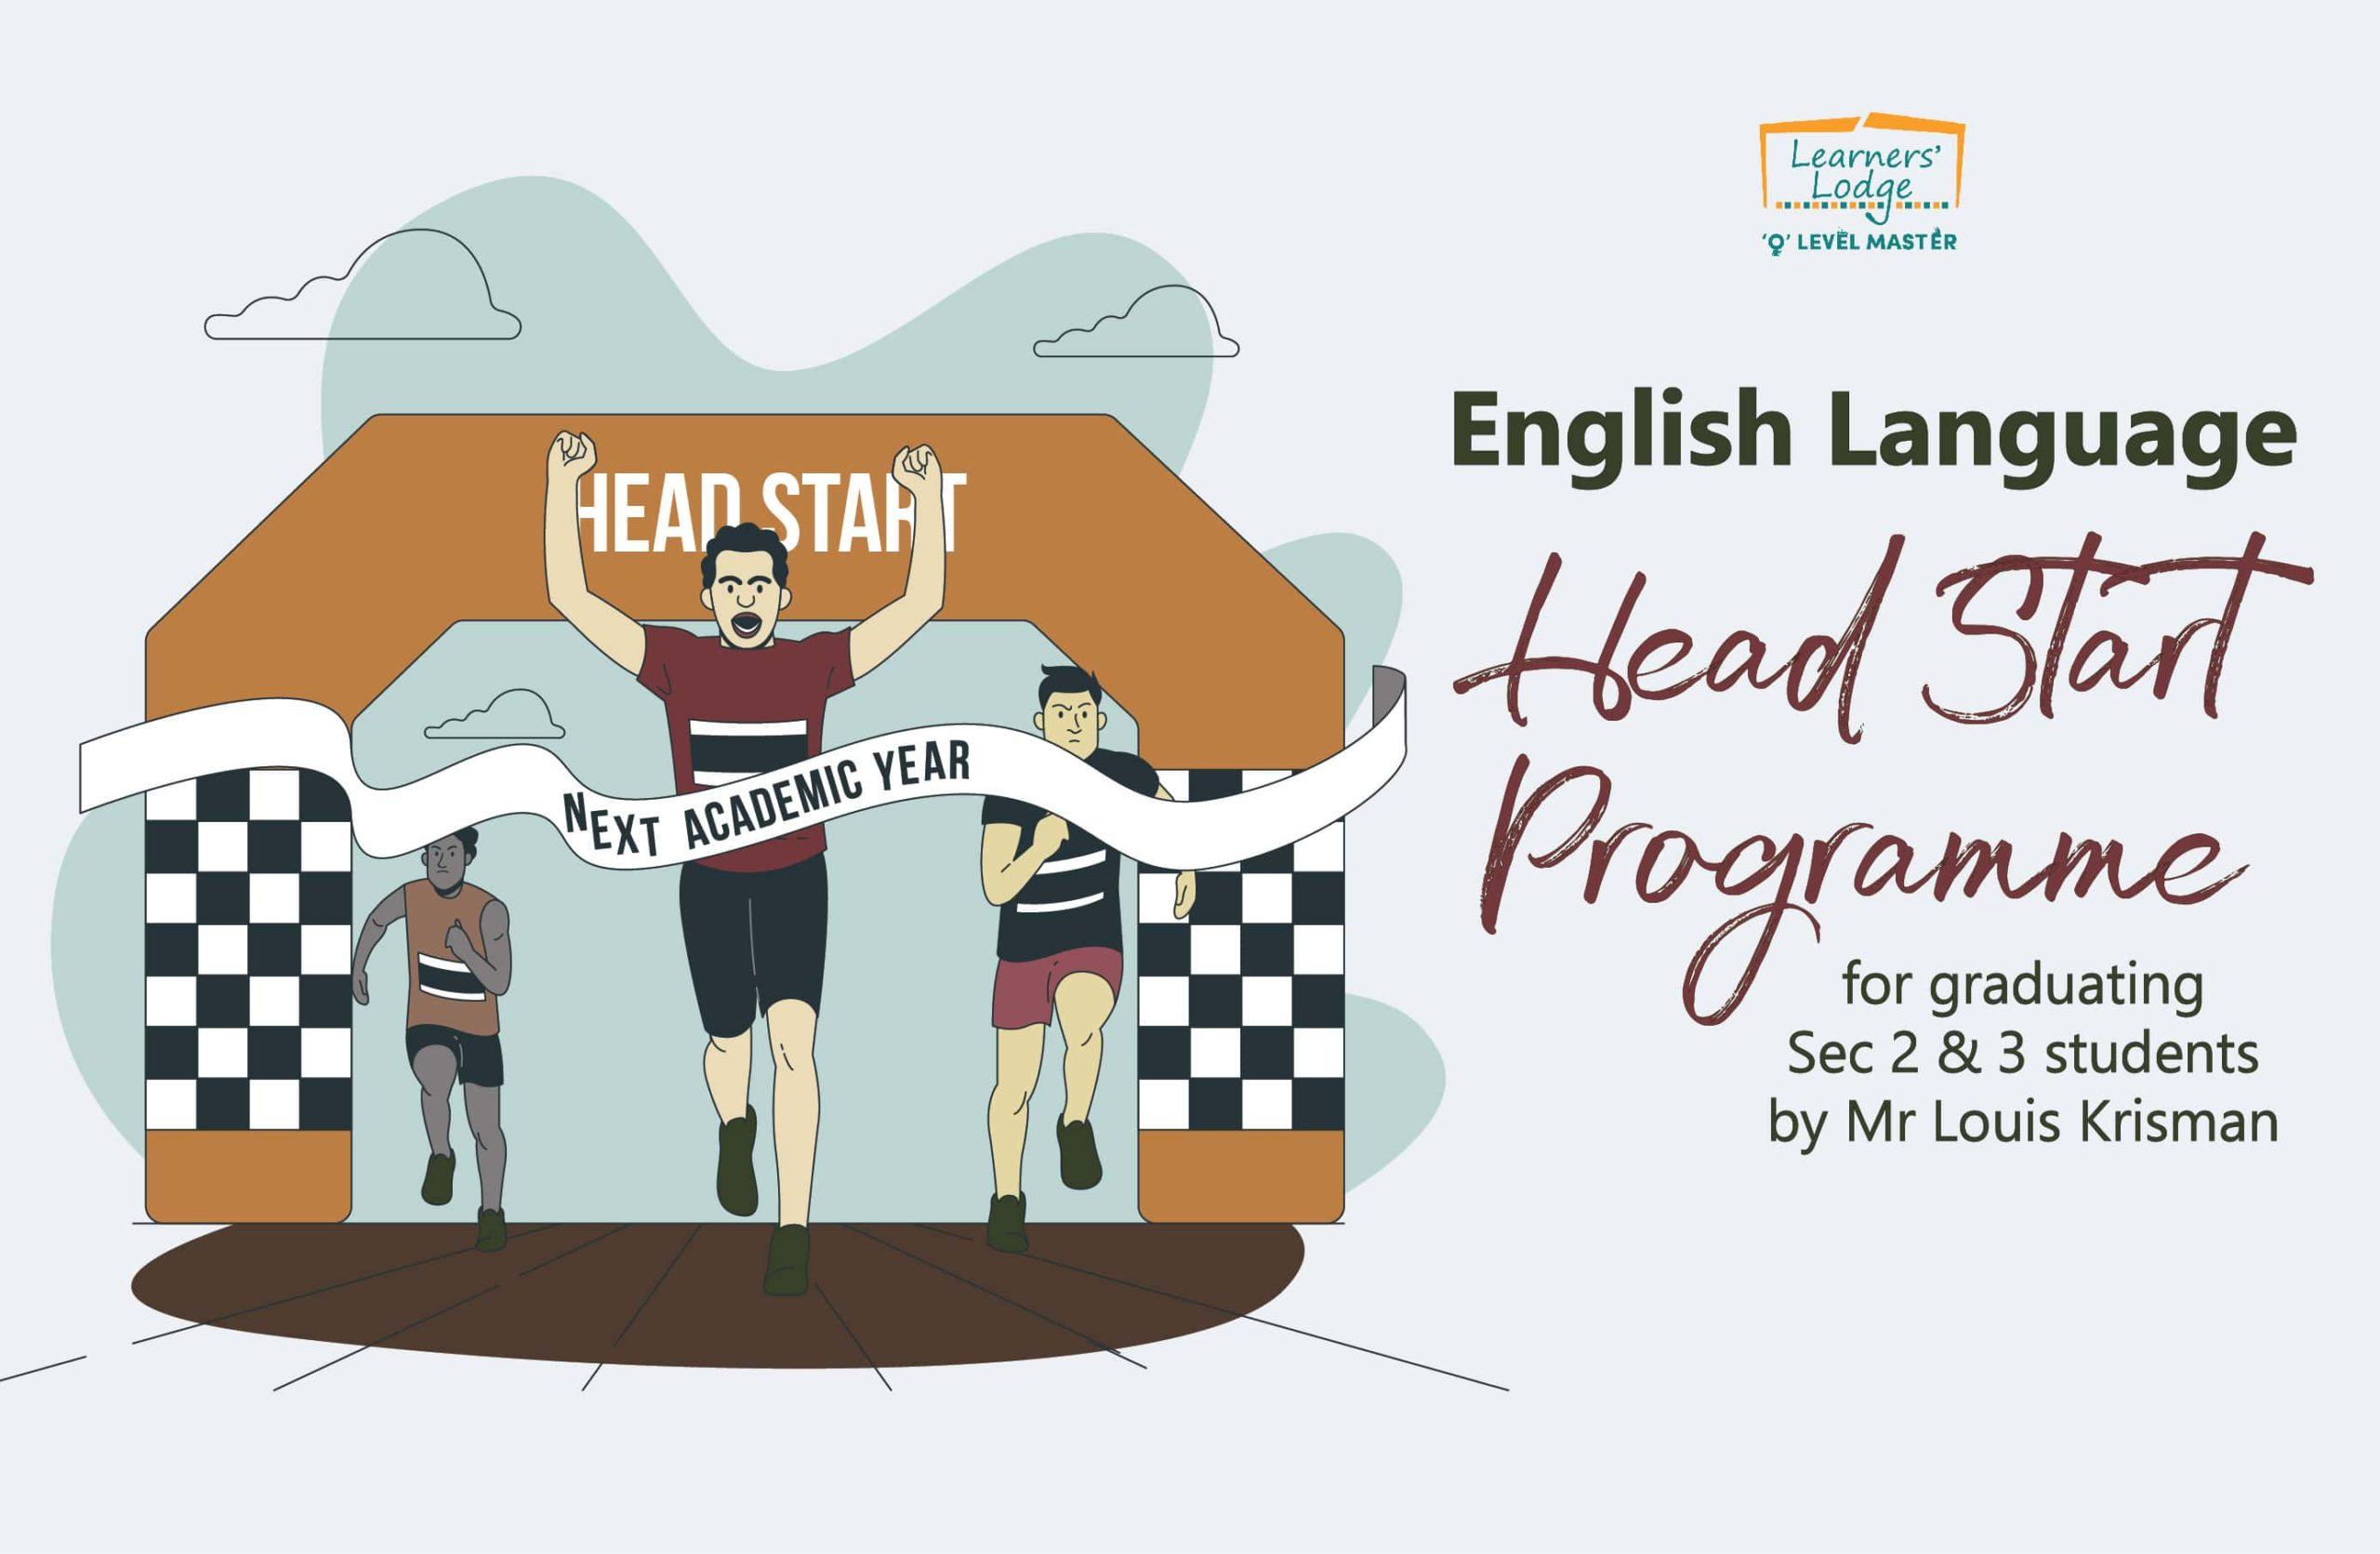 English Language Head Start Programme